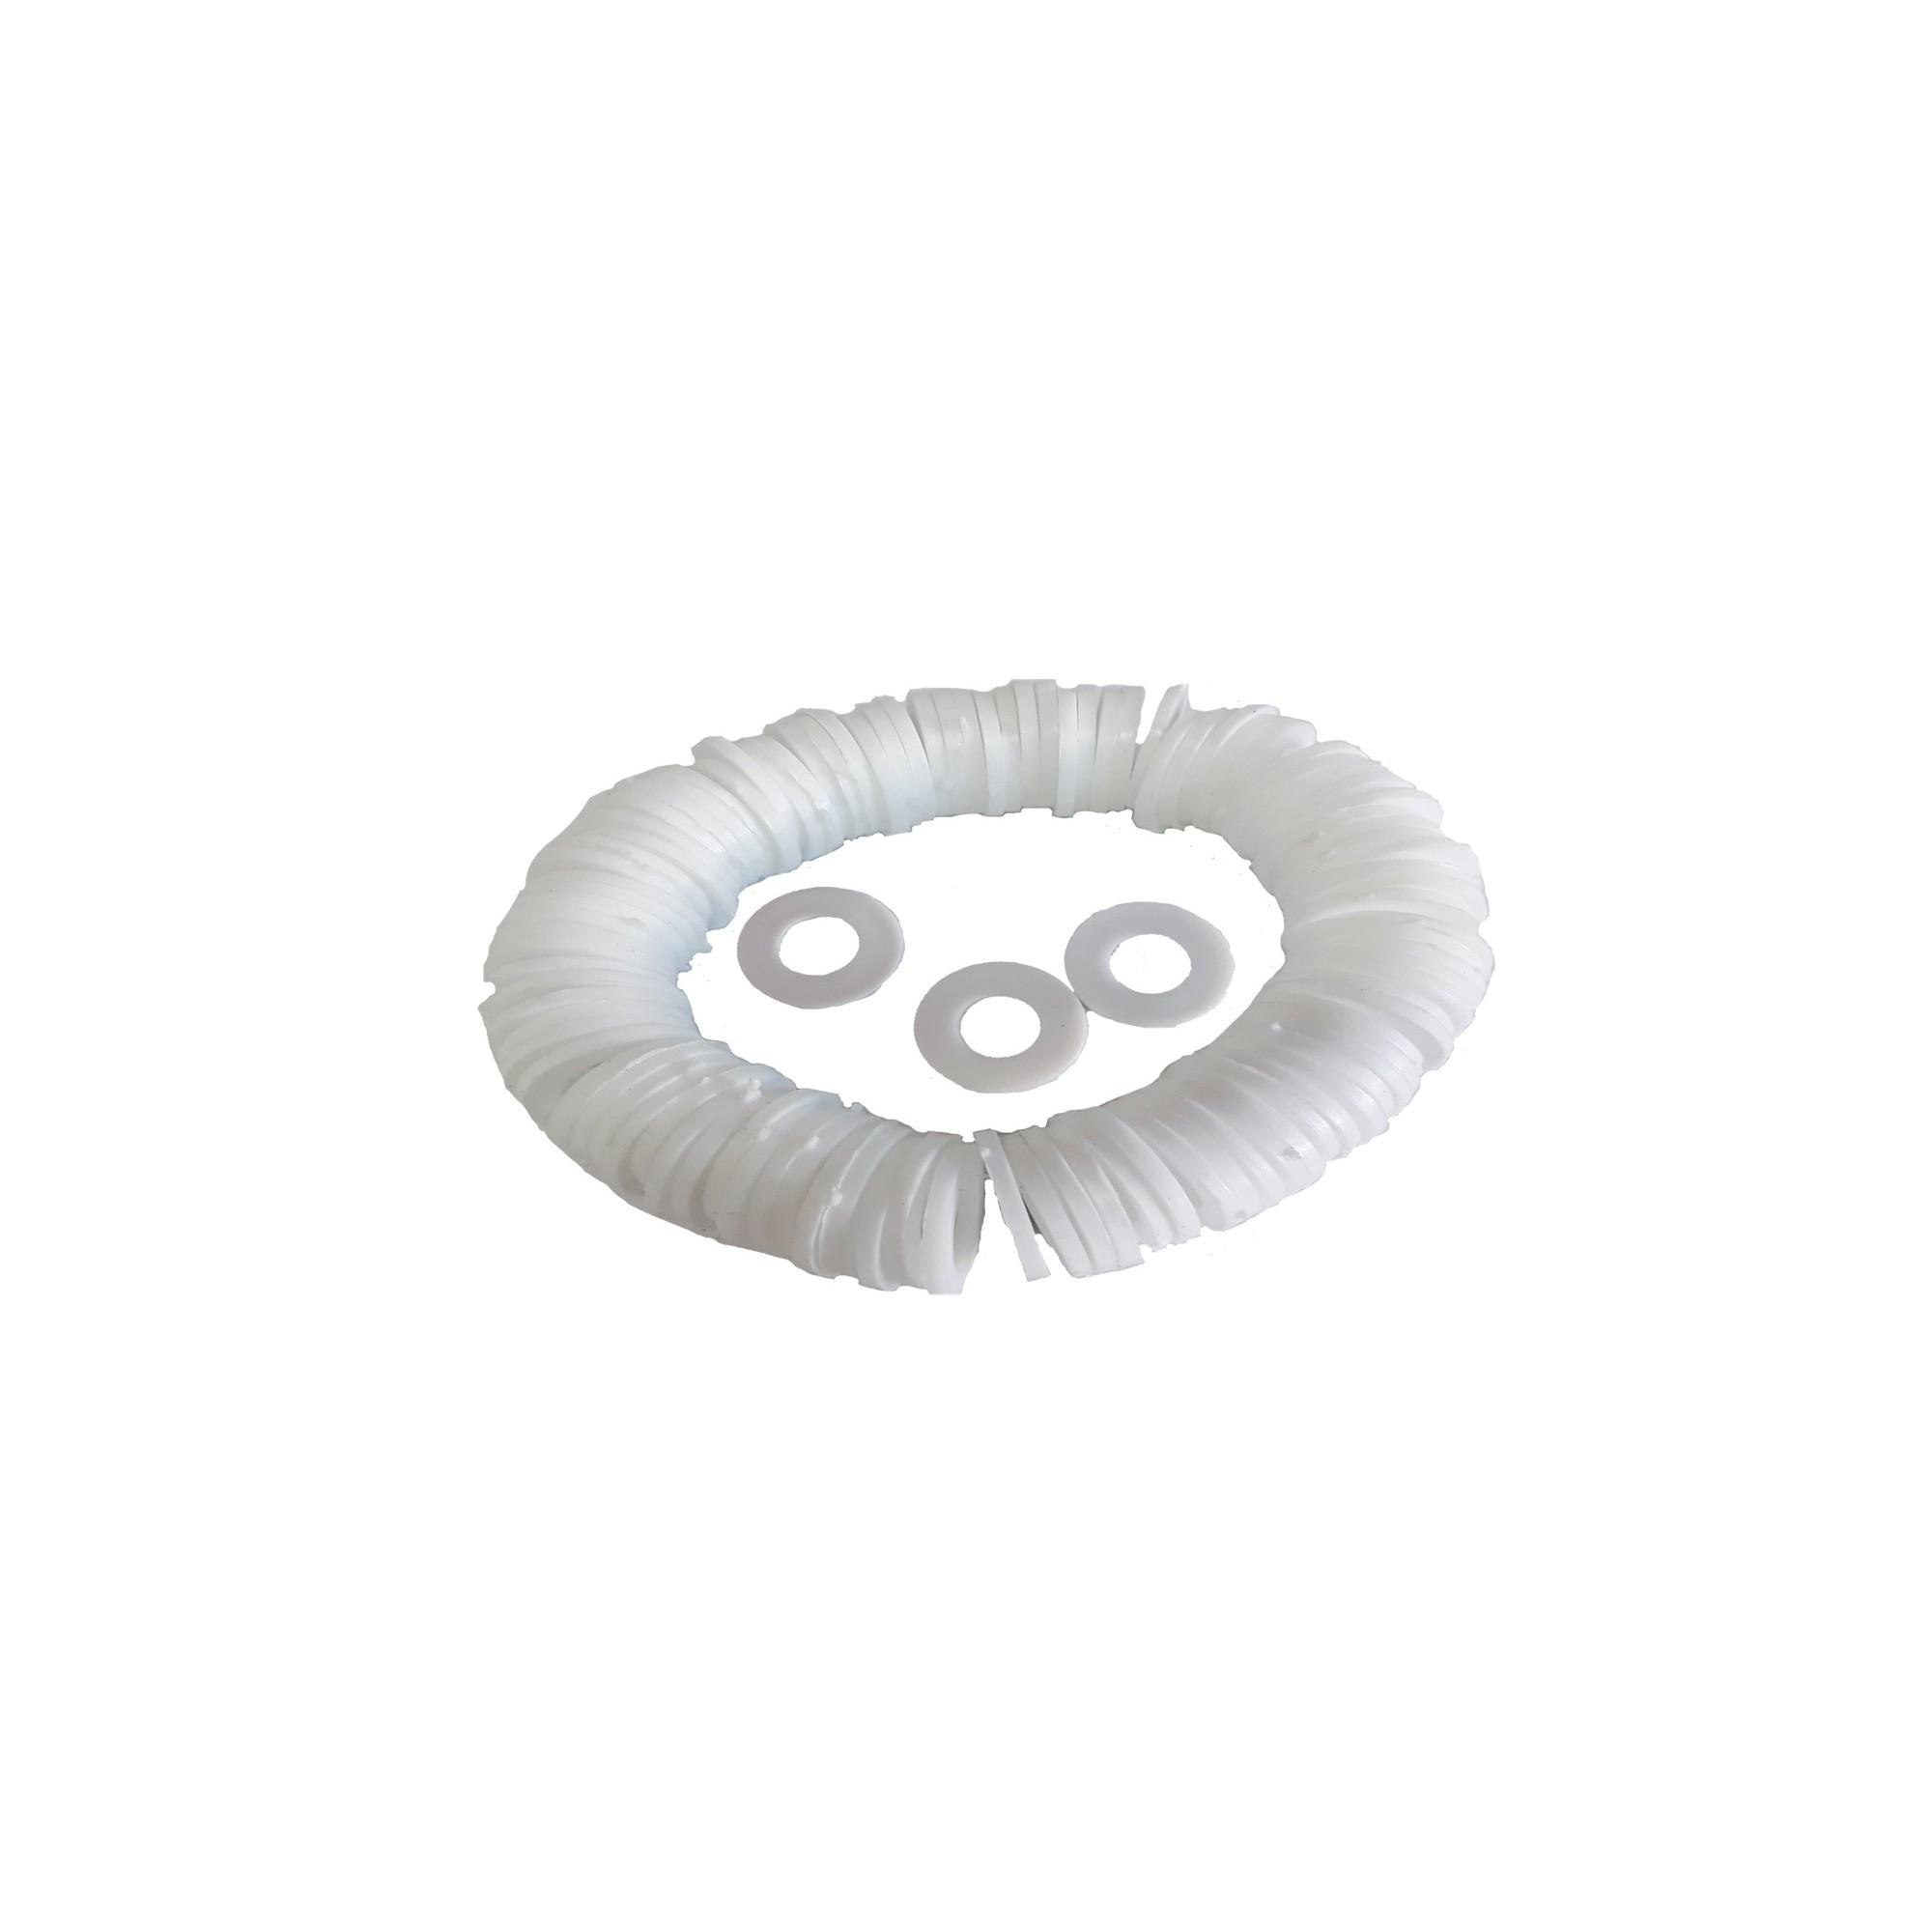 Упаковка фторопластовых прокладок 100 шт 1/2 J.G. - 1